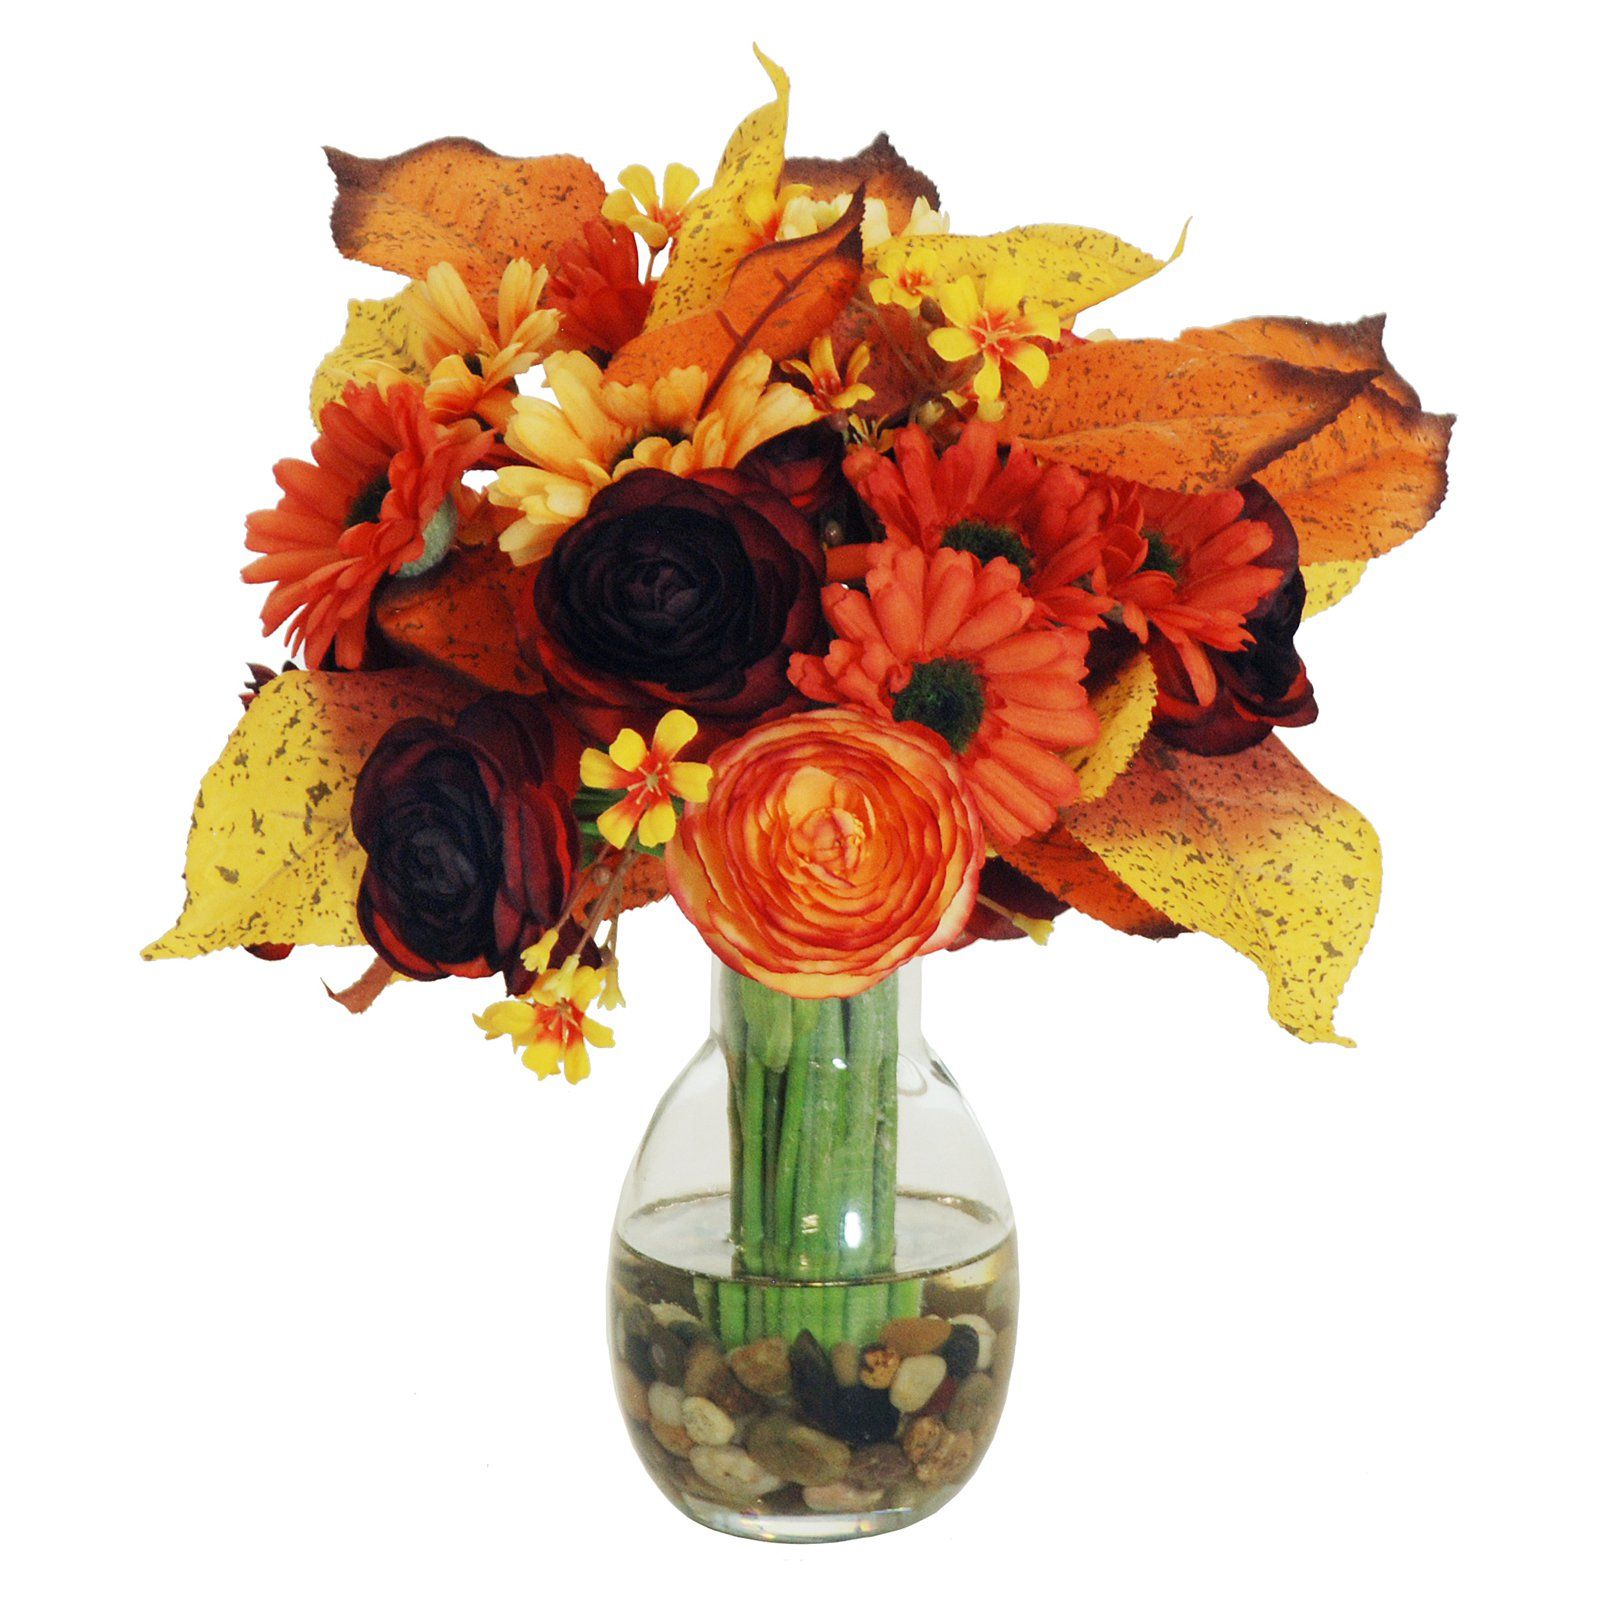 Jane Seymour Botanicals 11 in. Fall Fun Colors Bouquet wi...